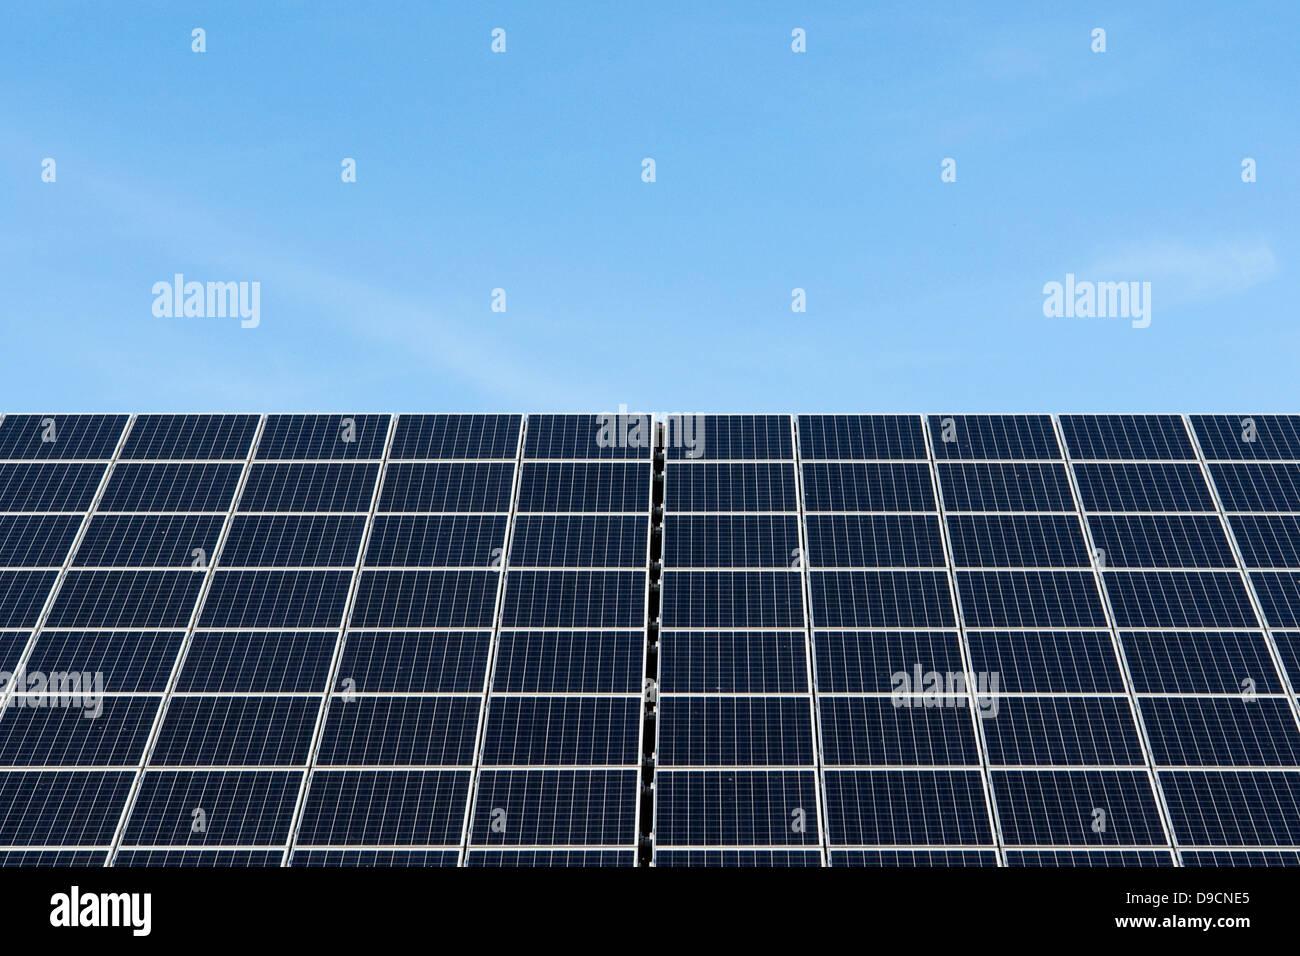 Las células solares, células solares, Imagen De Stock